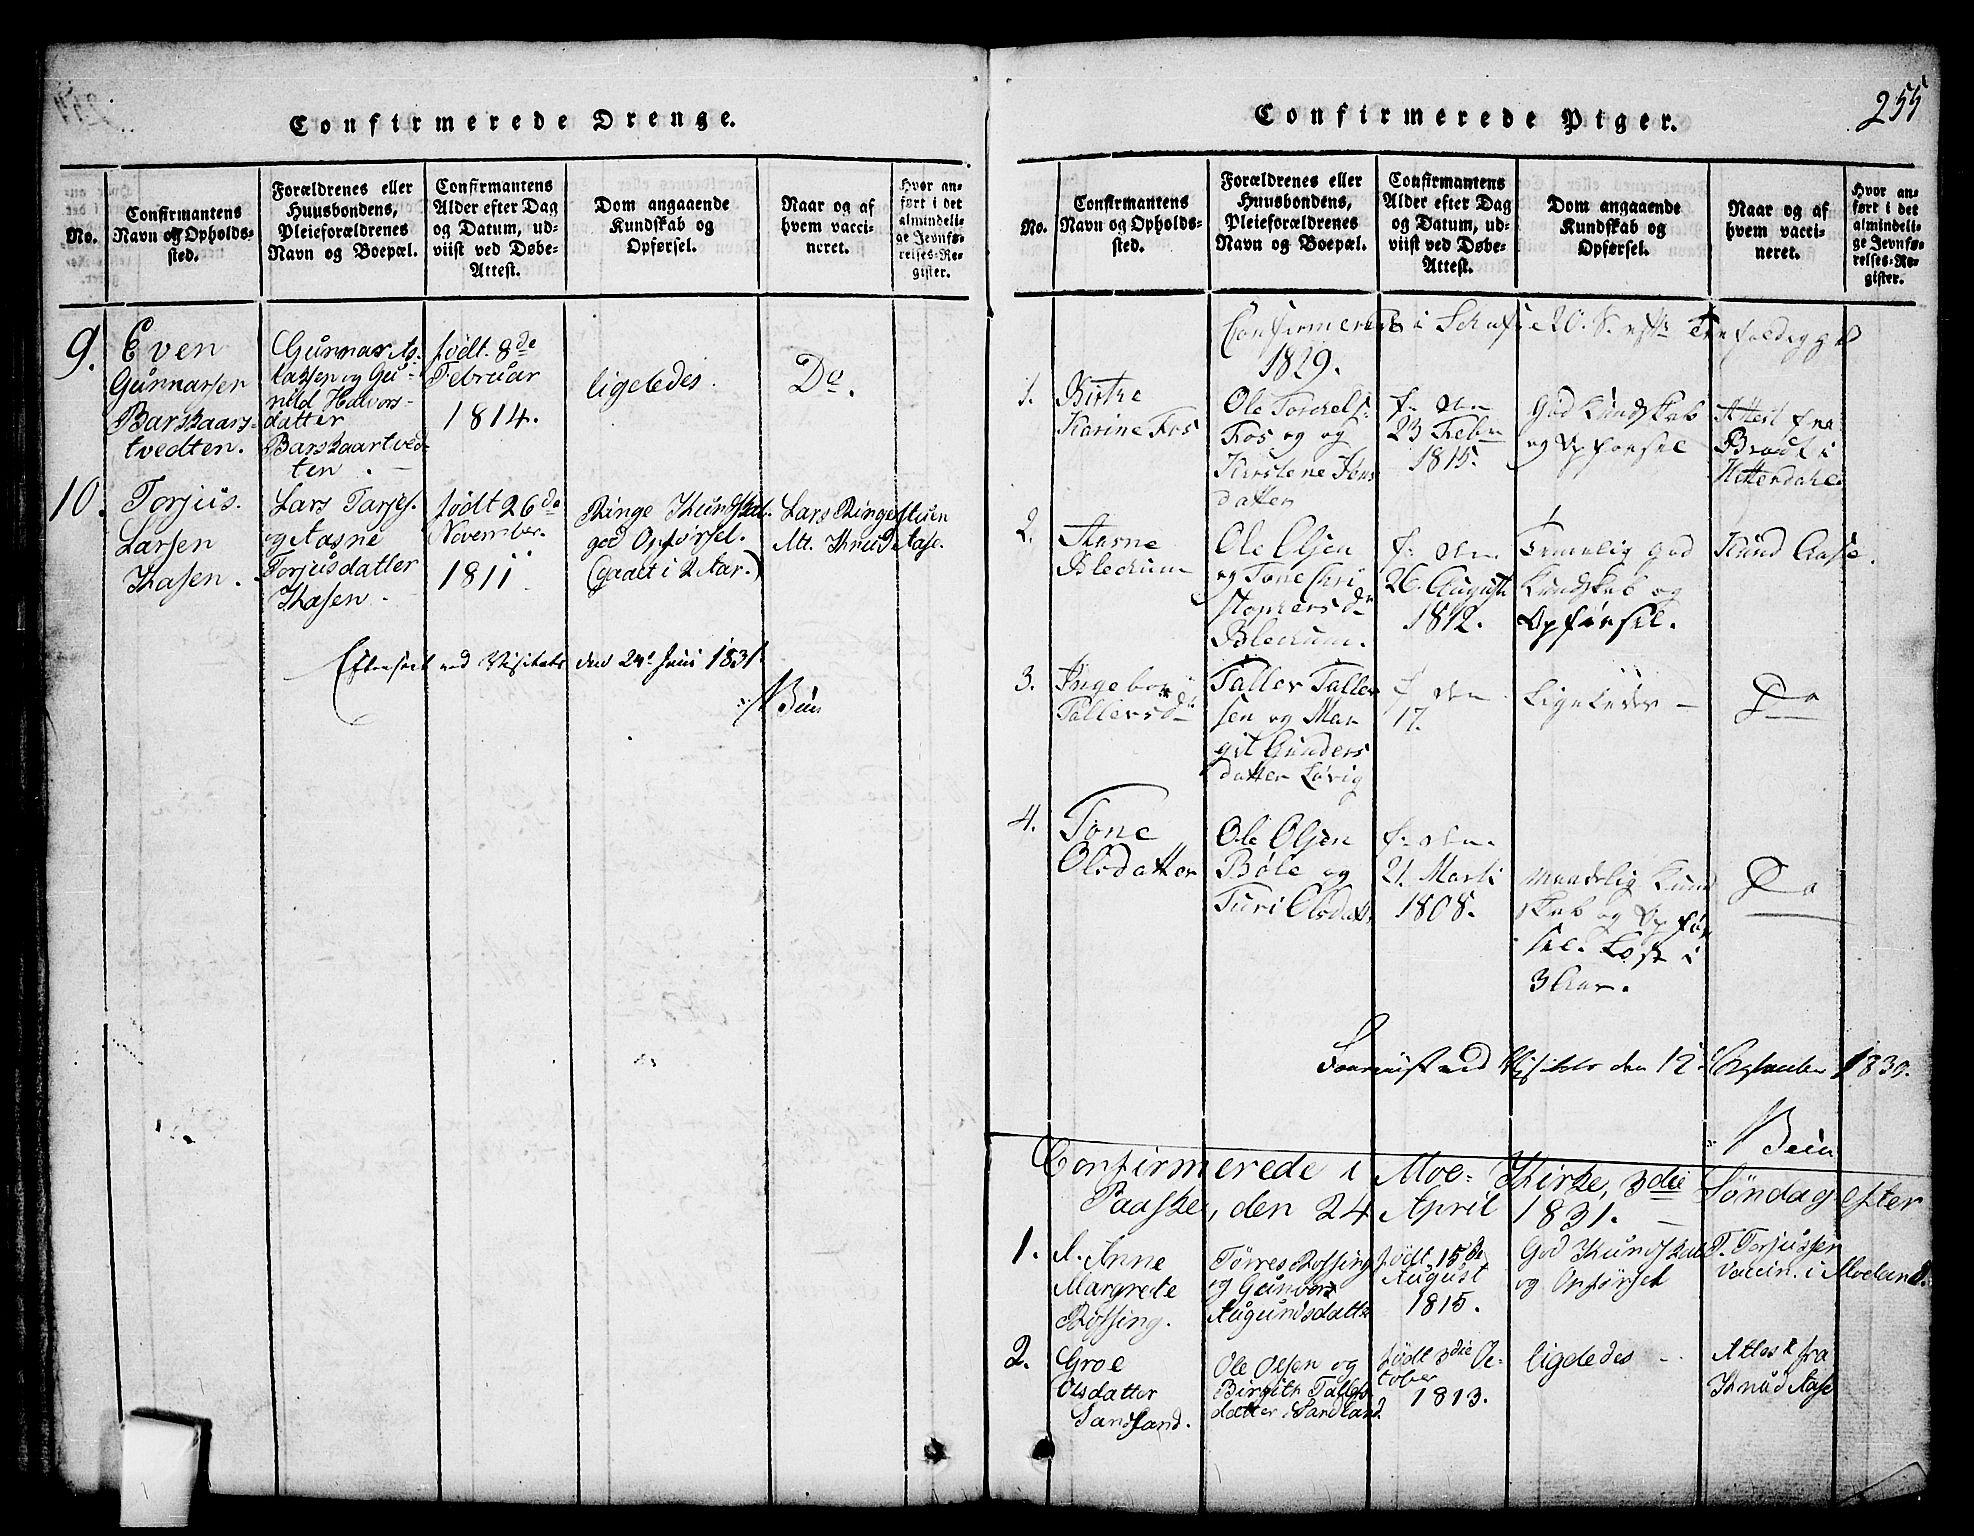 SAKO, Mo kirkebøker, G/Gb/L0001: Klokkerbok nr. II 1, 1814-1843, s. 255